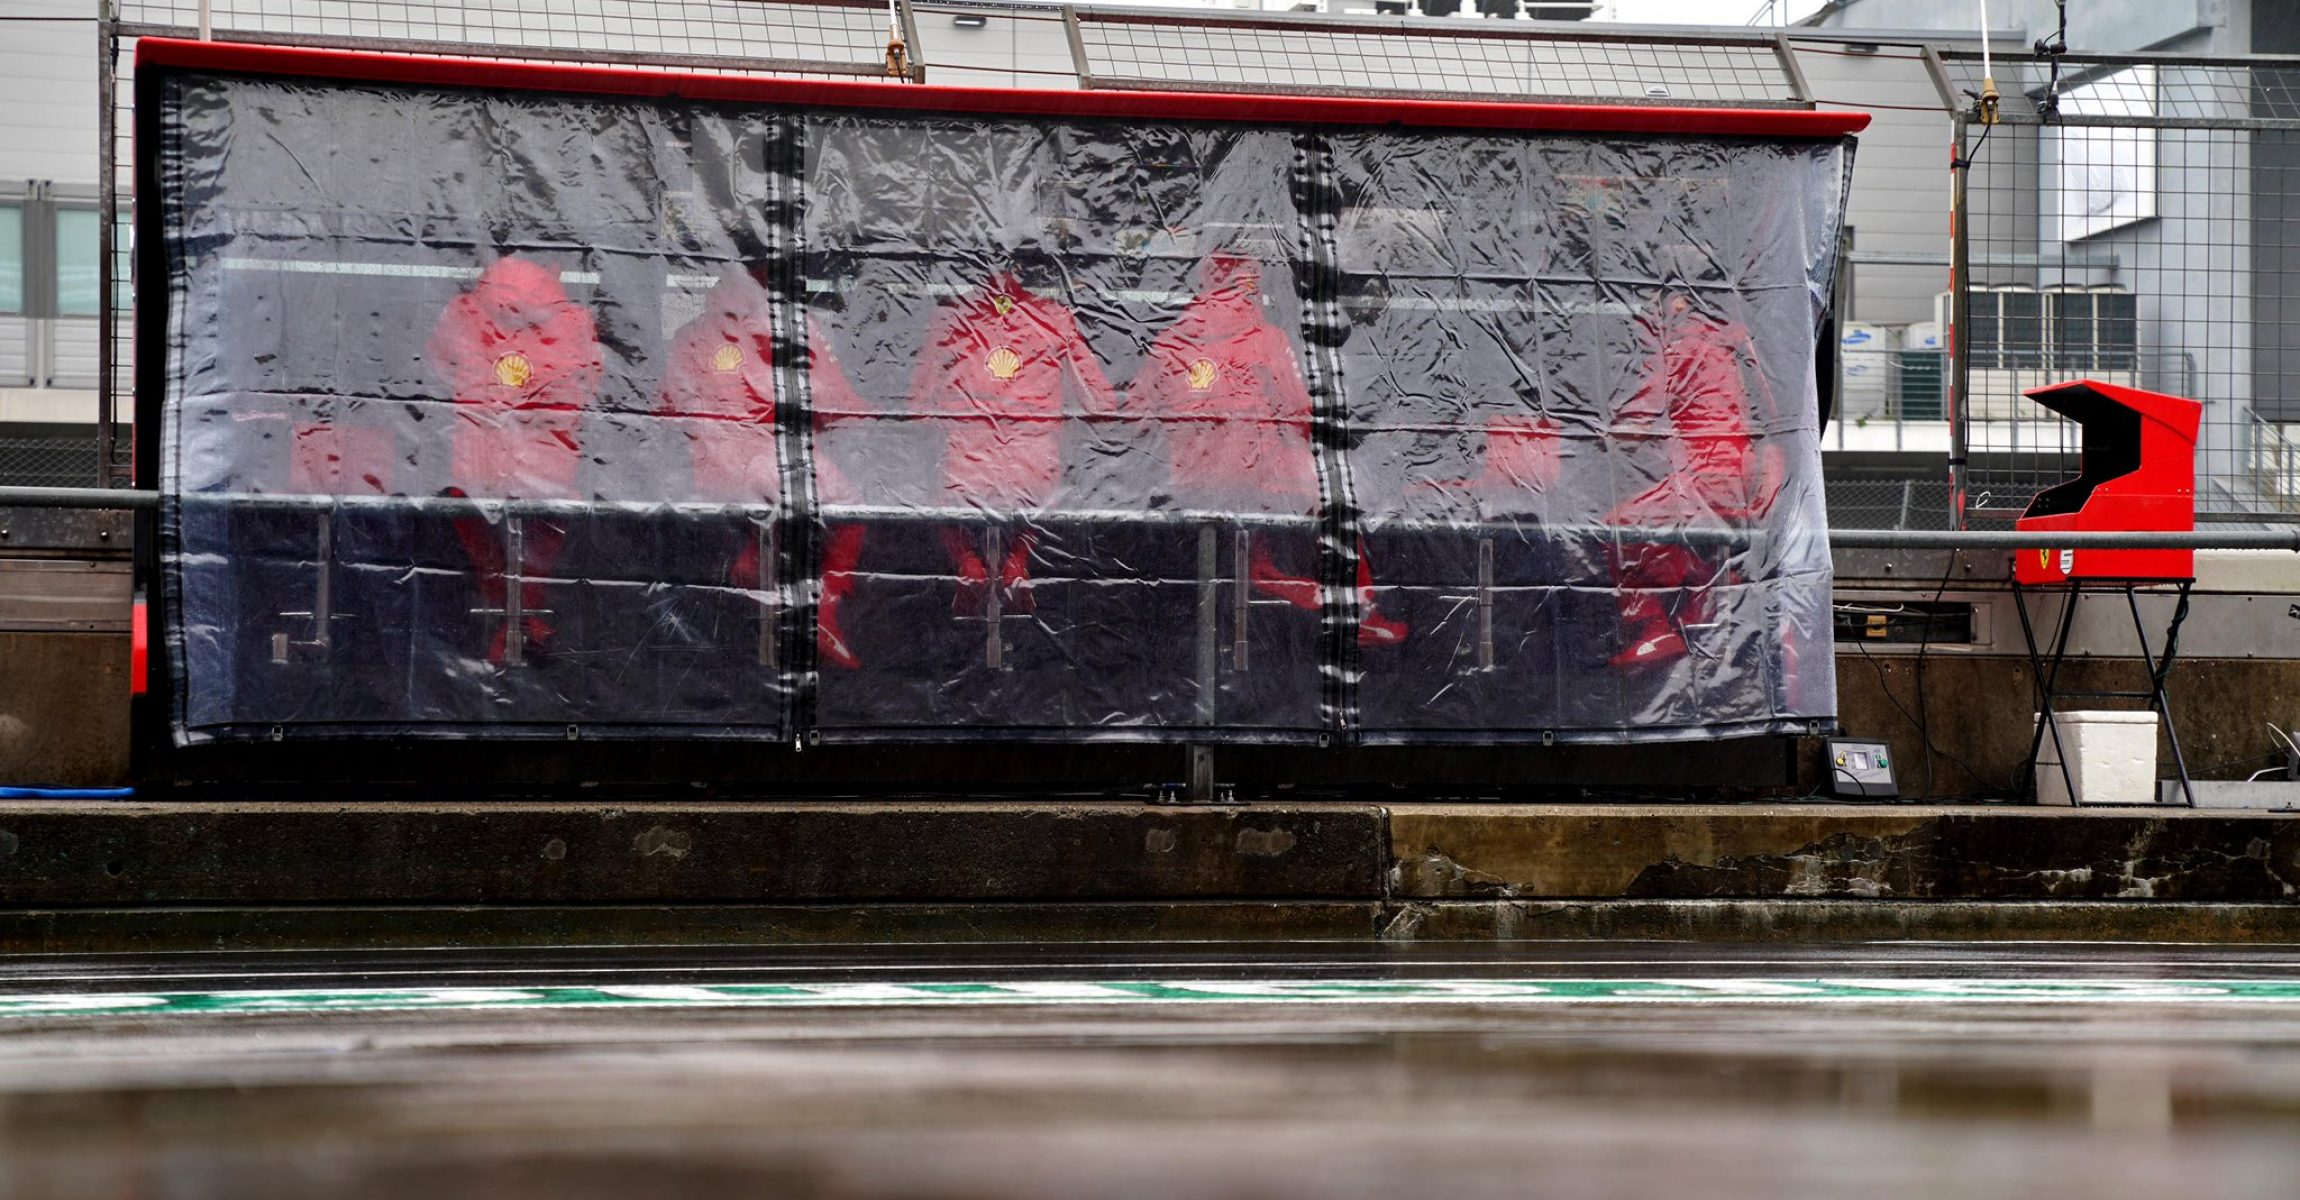 Ferrari pitwall rain